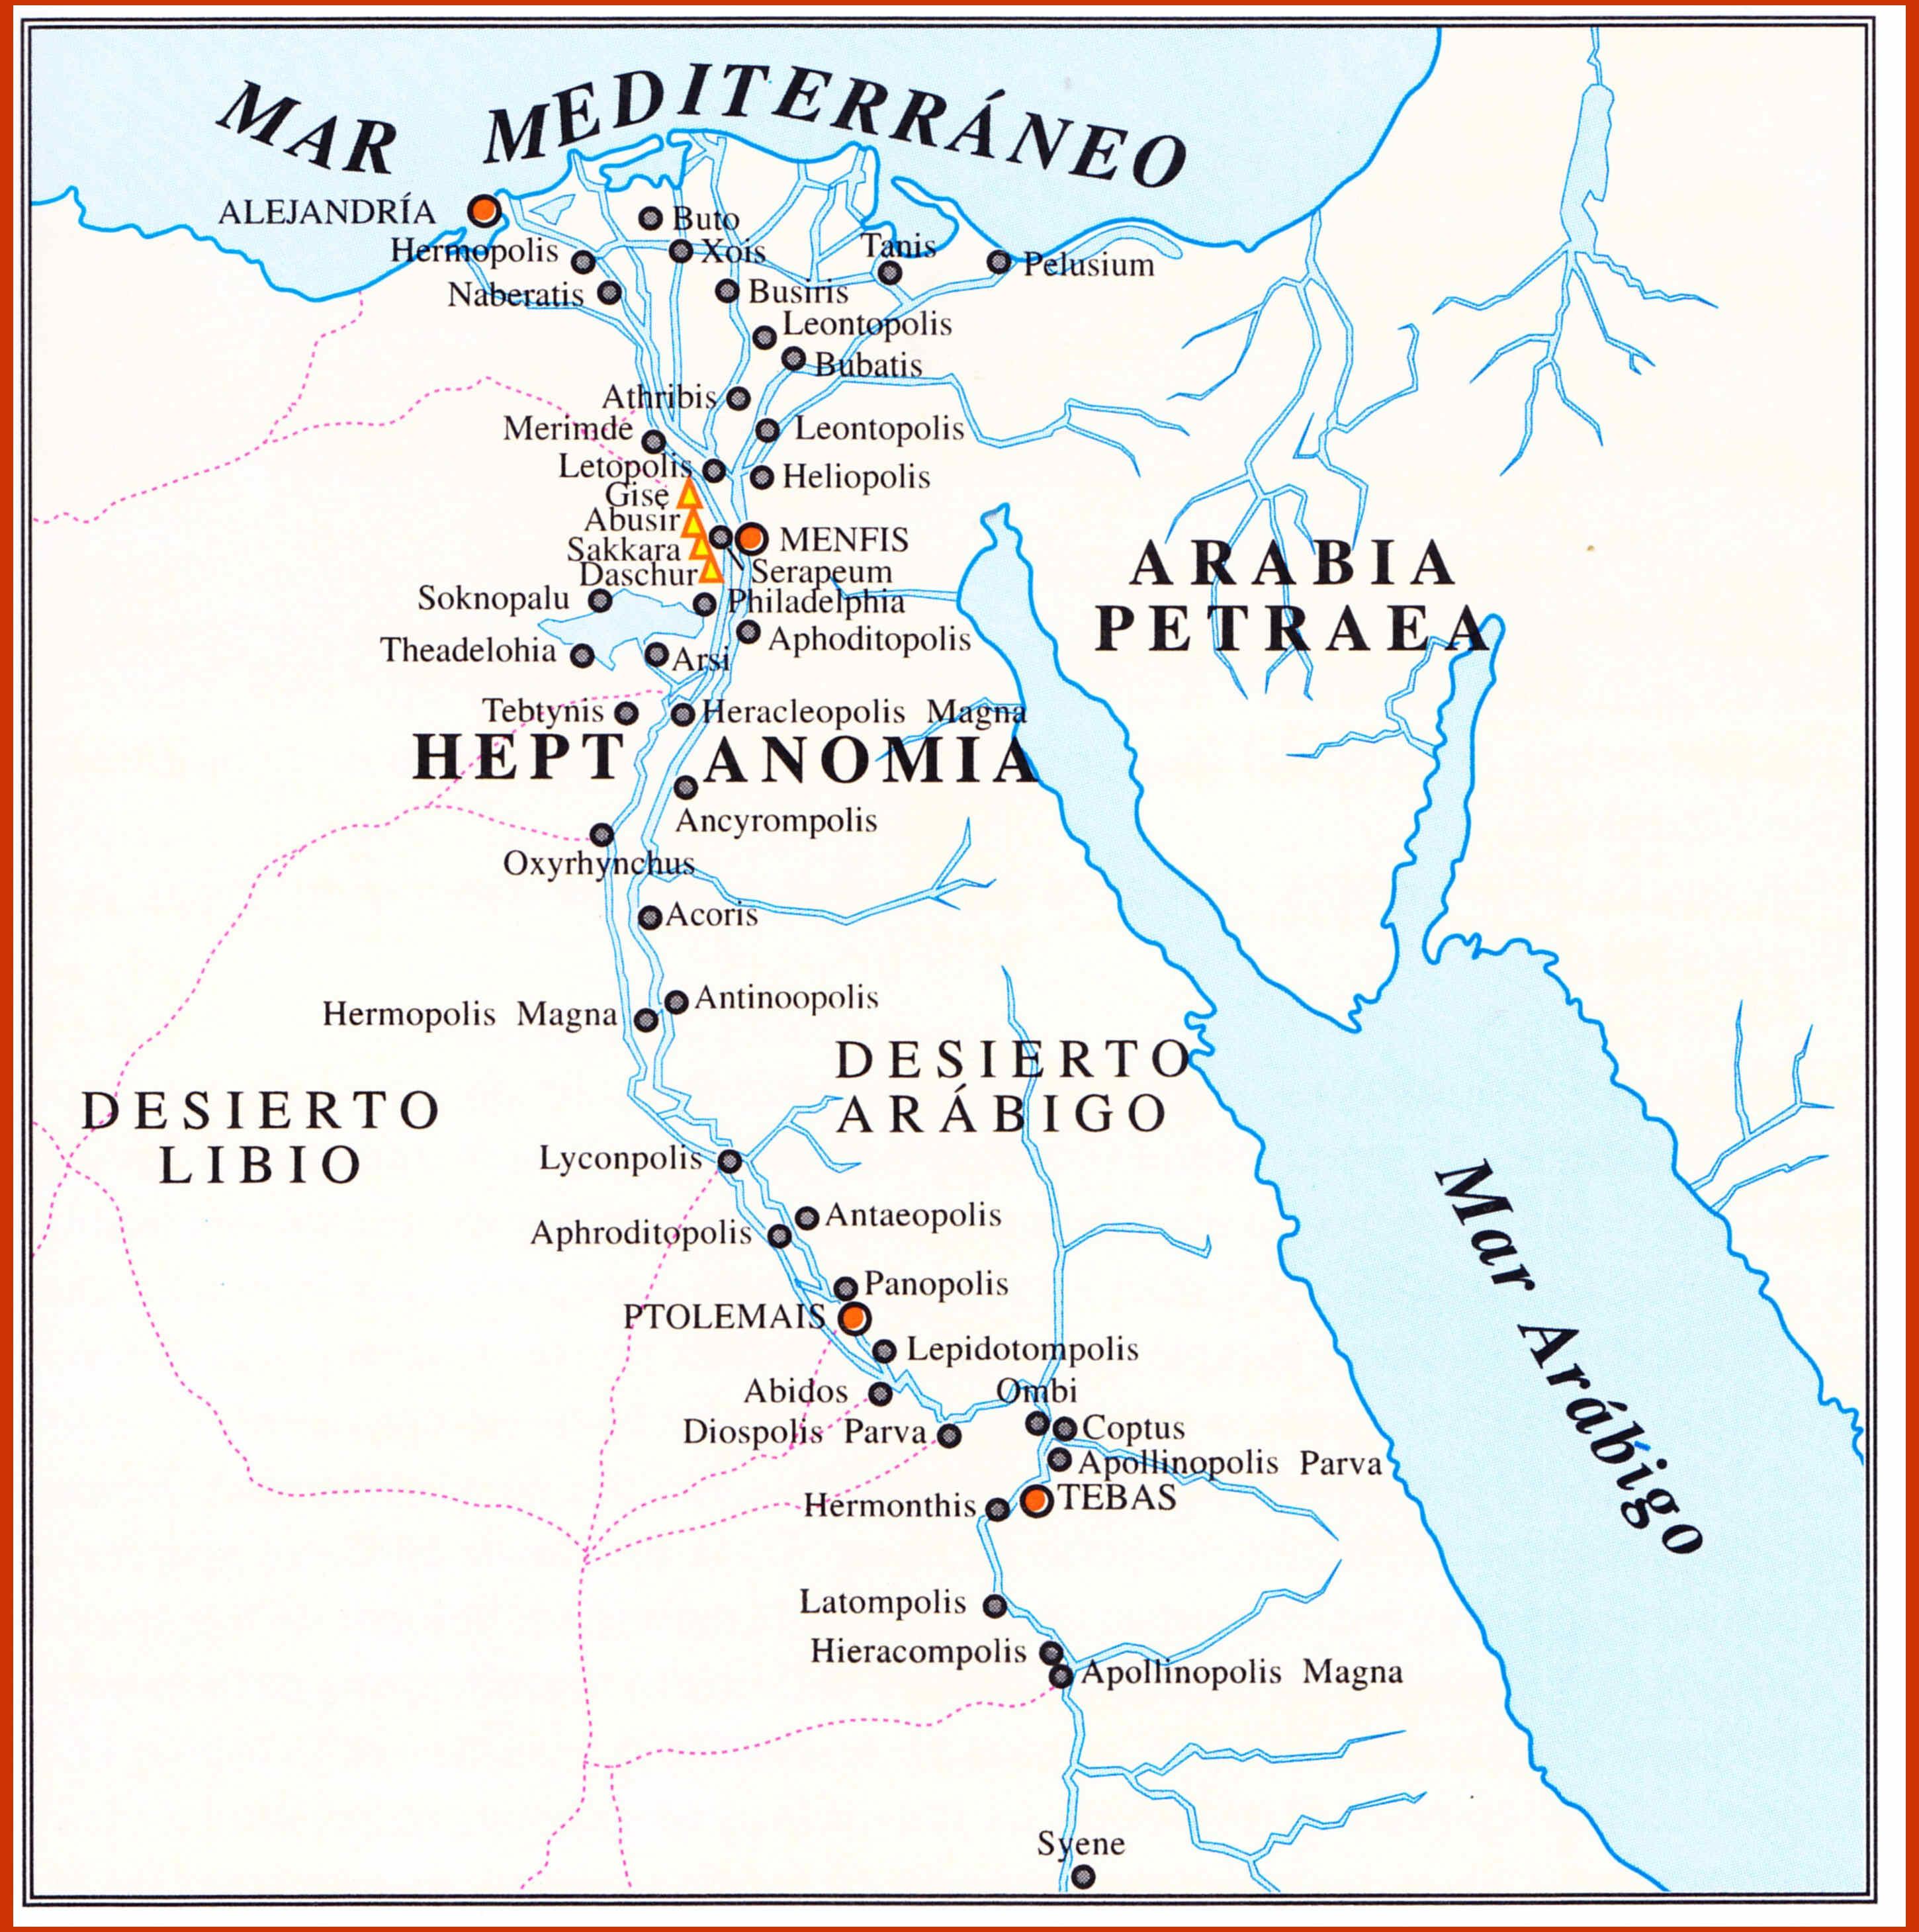 Egipto Antiguo 60 y Ptolomeo XII 3